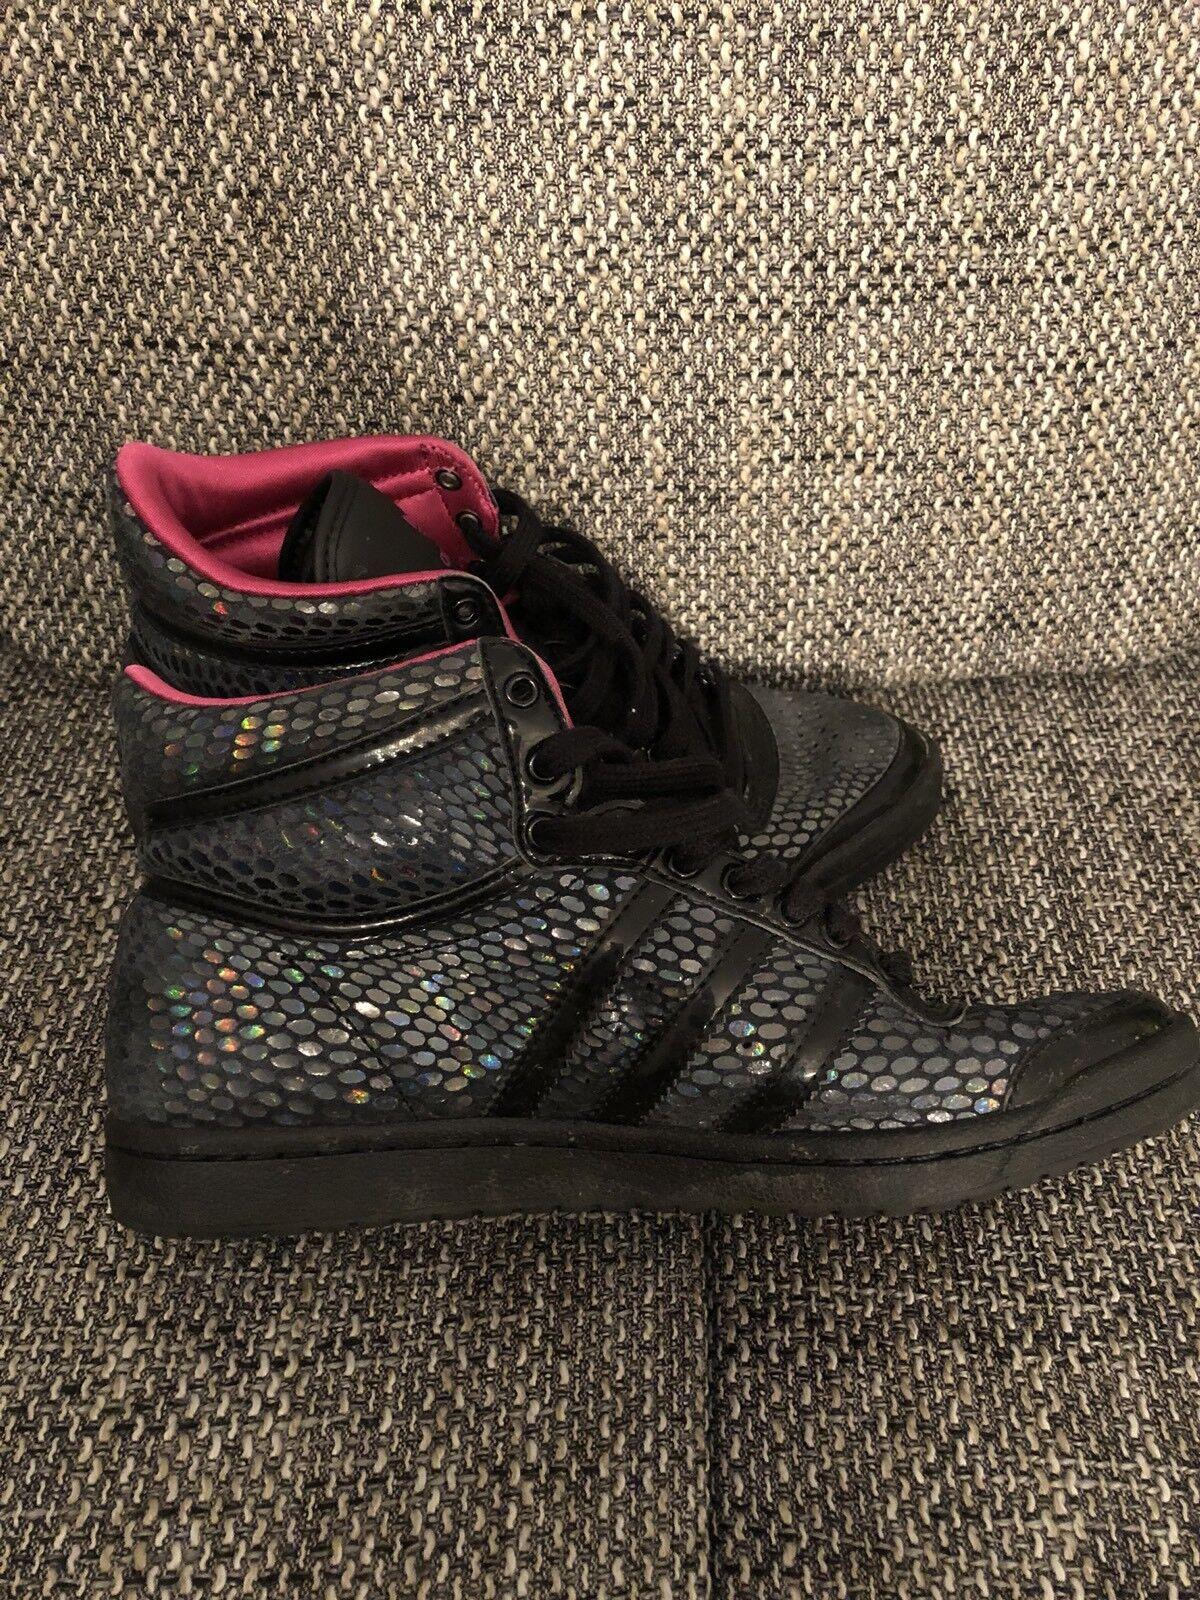 Adidas Originals Damen Sneaker TOP TEN Schwarz HI SLEEK W , Schwarz TEN , EUR 36 2/3 201d86